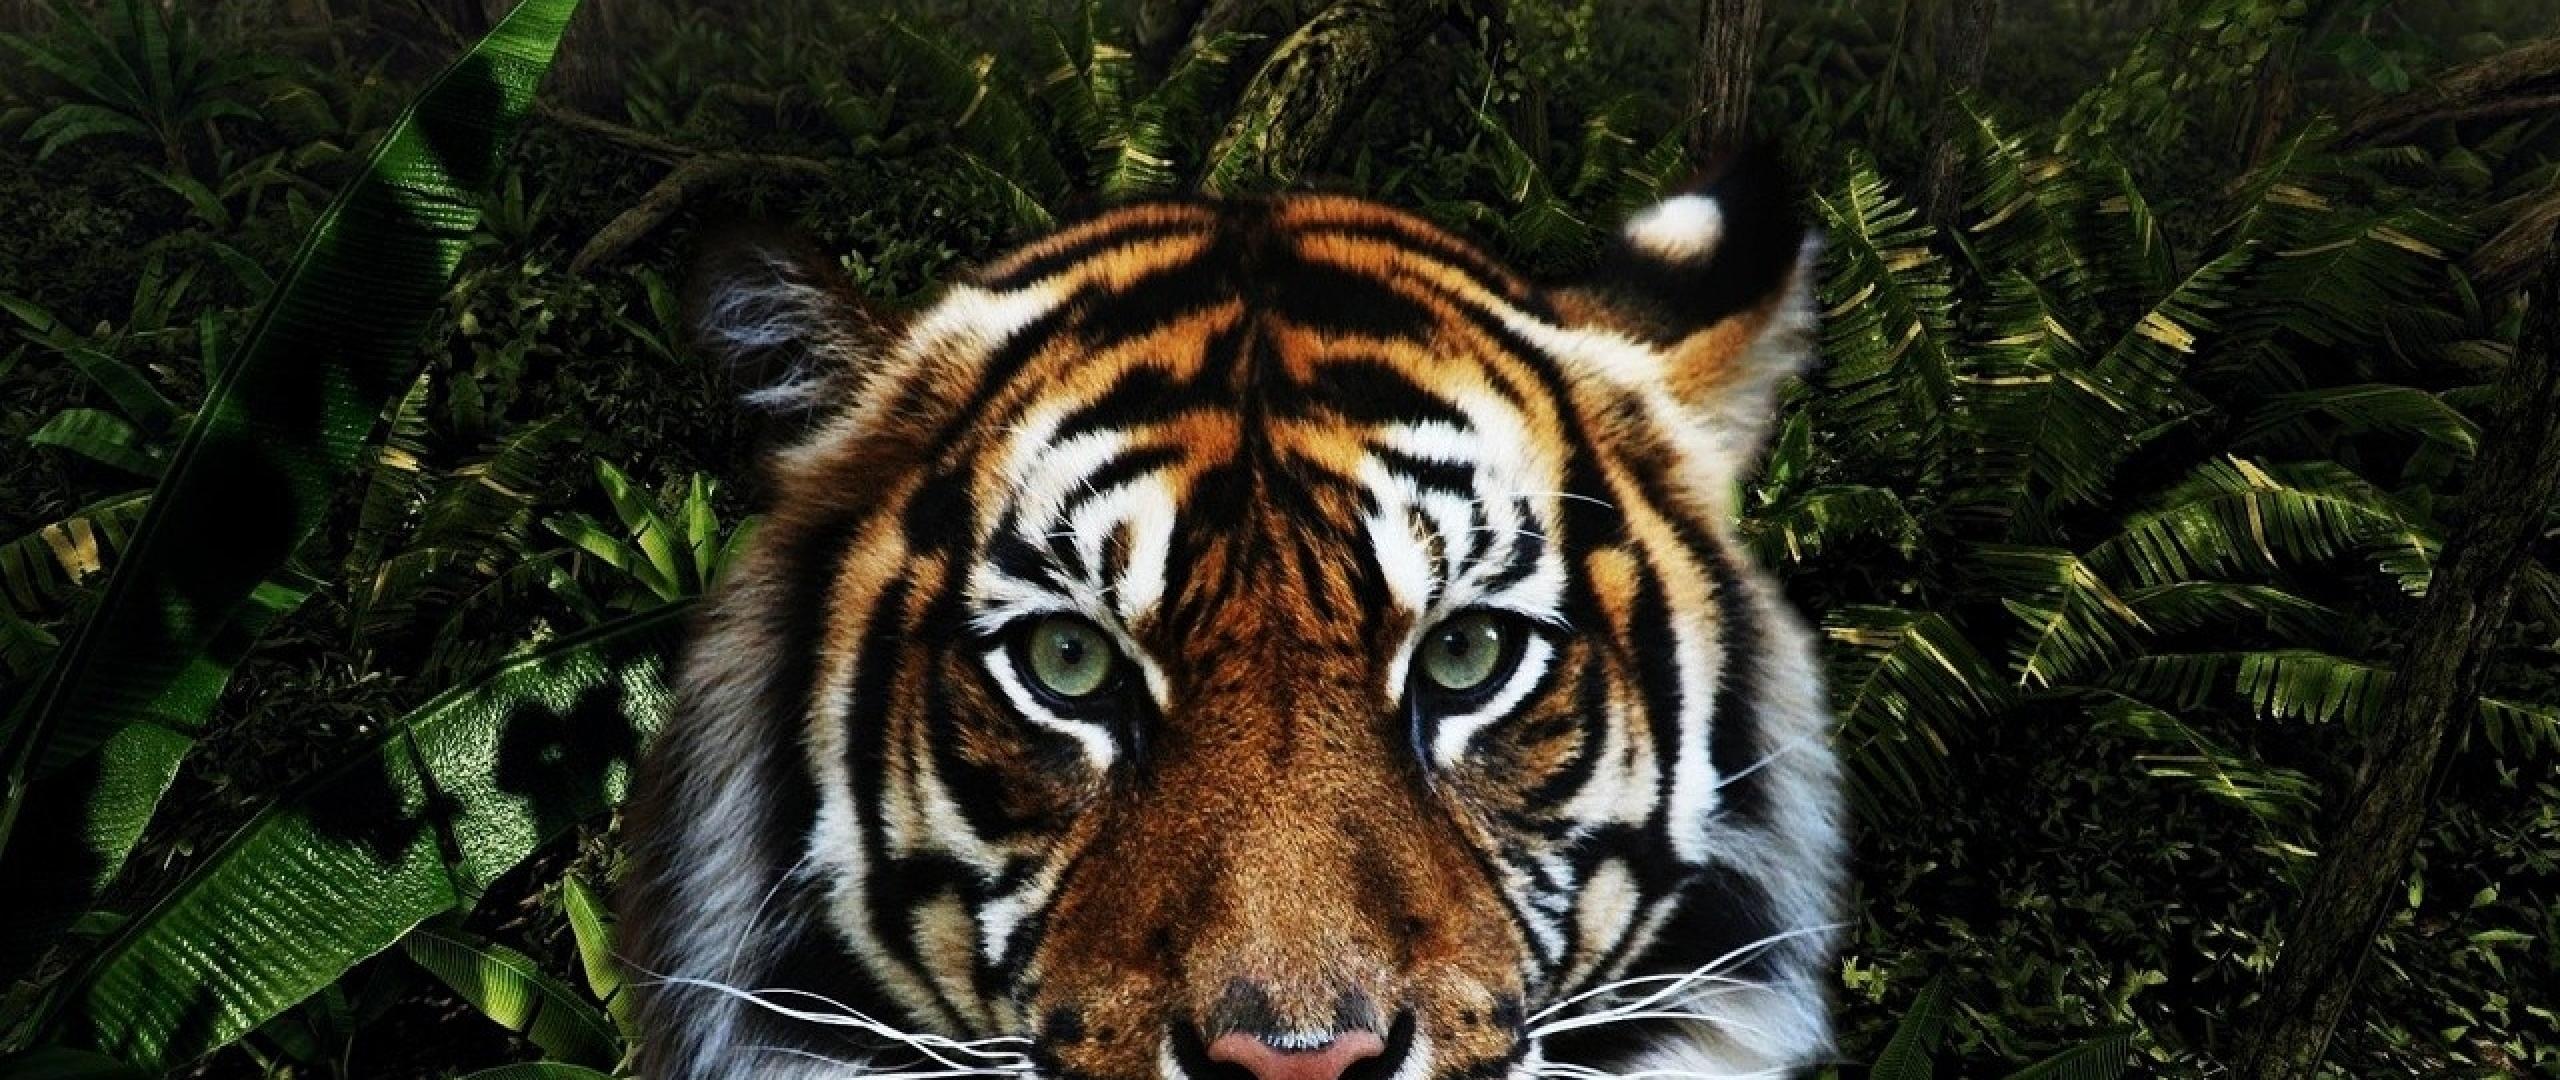 download 2560x1080 wallpaper king of jungle tiger, dual wide